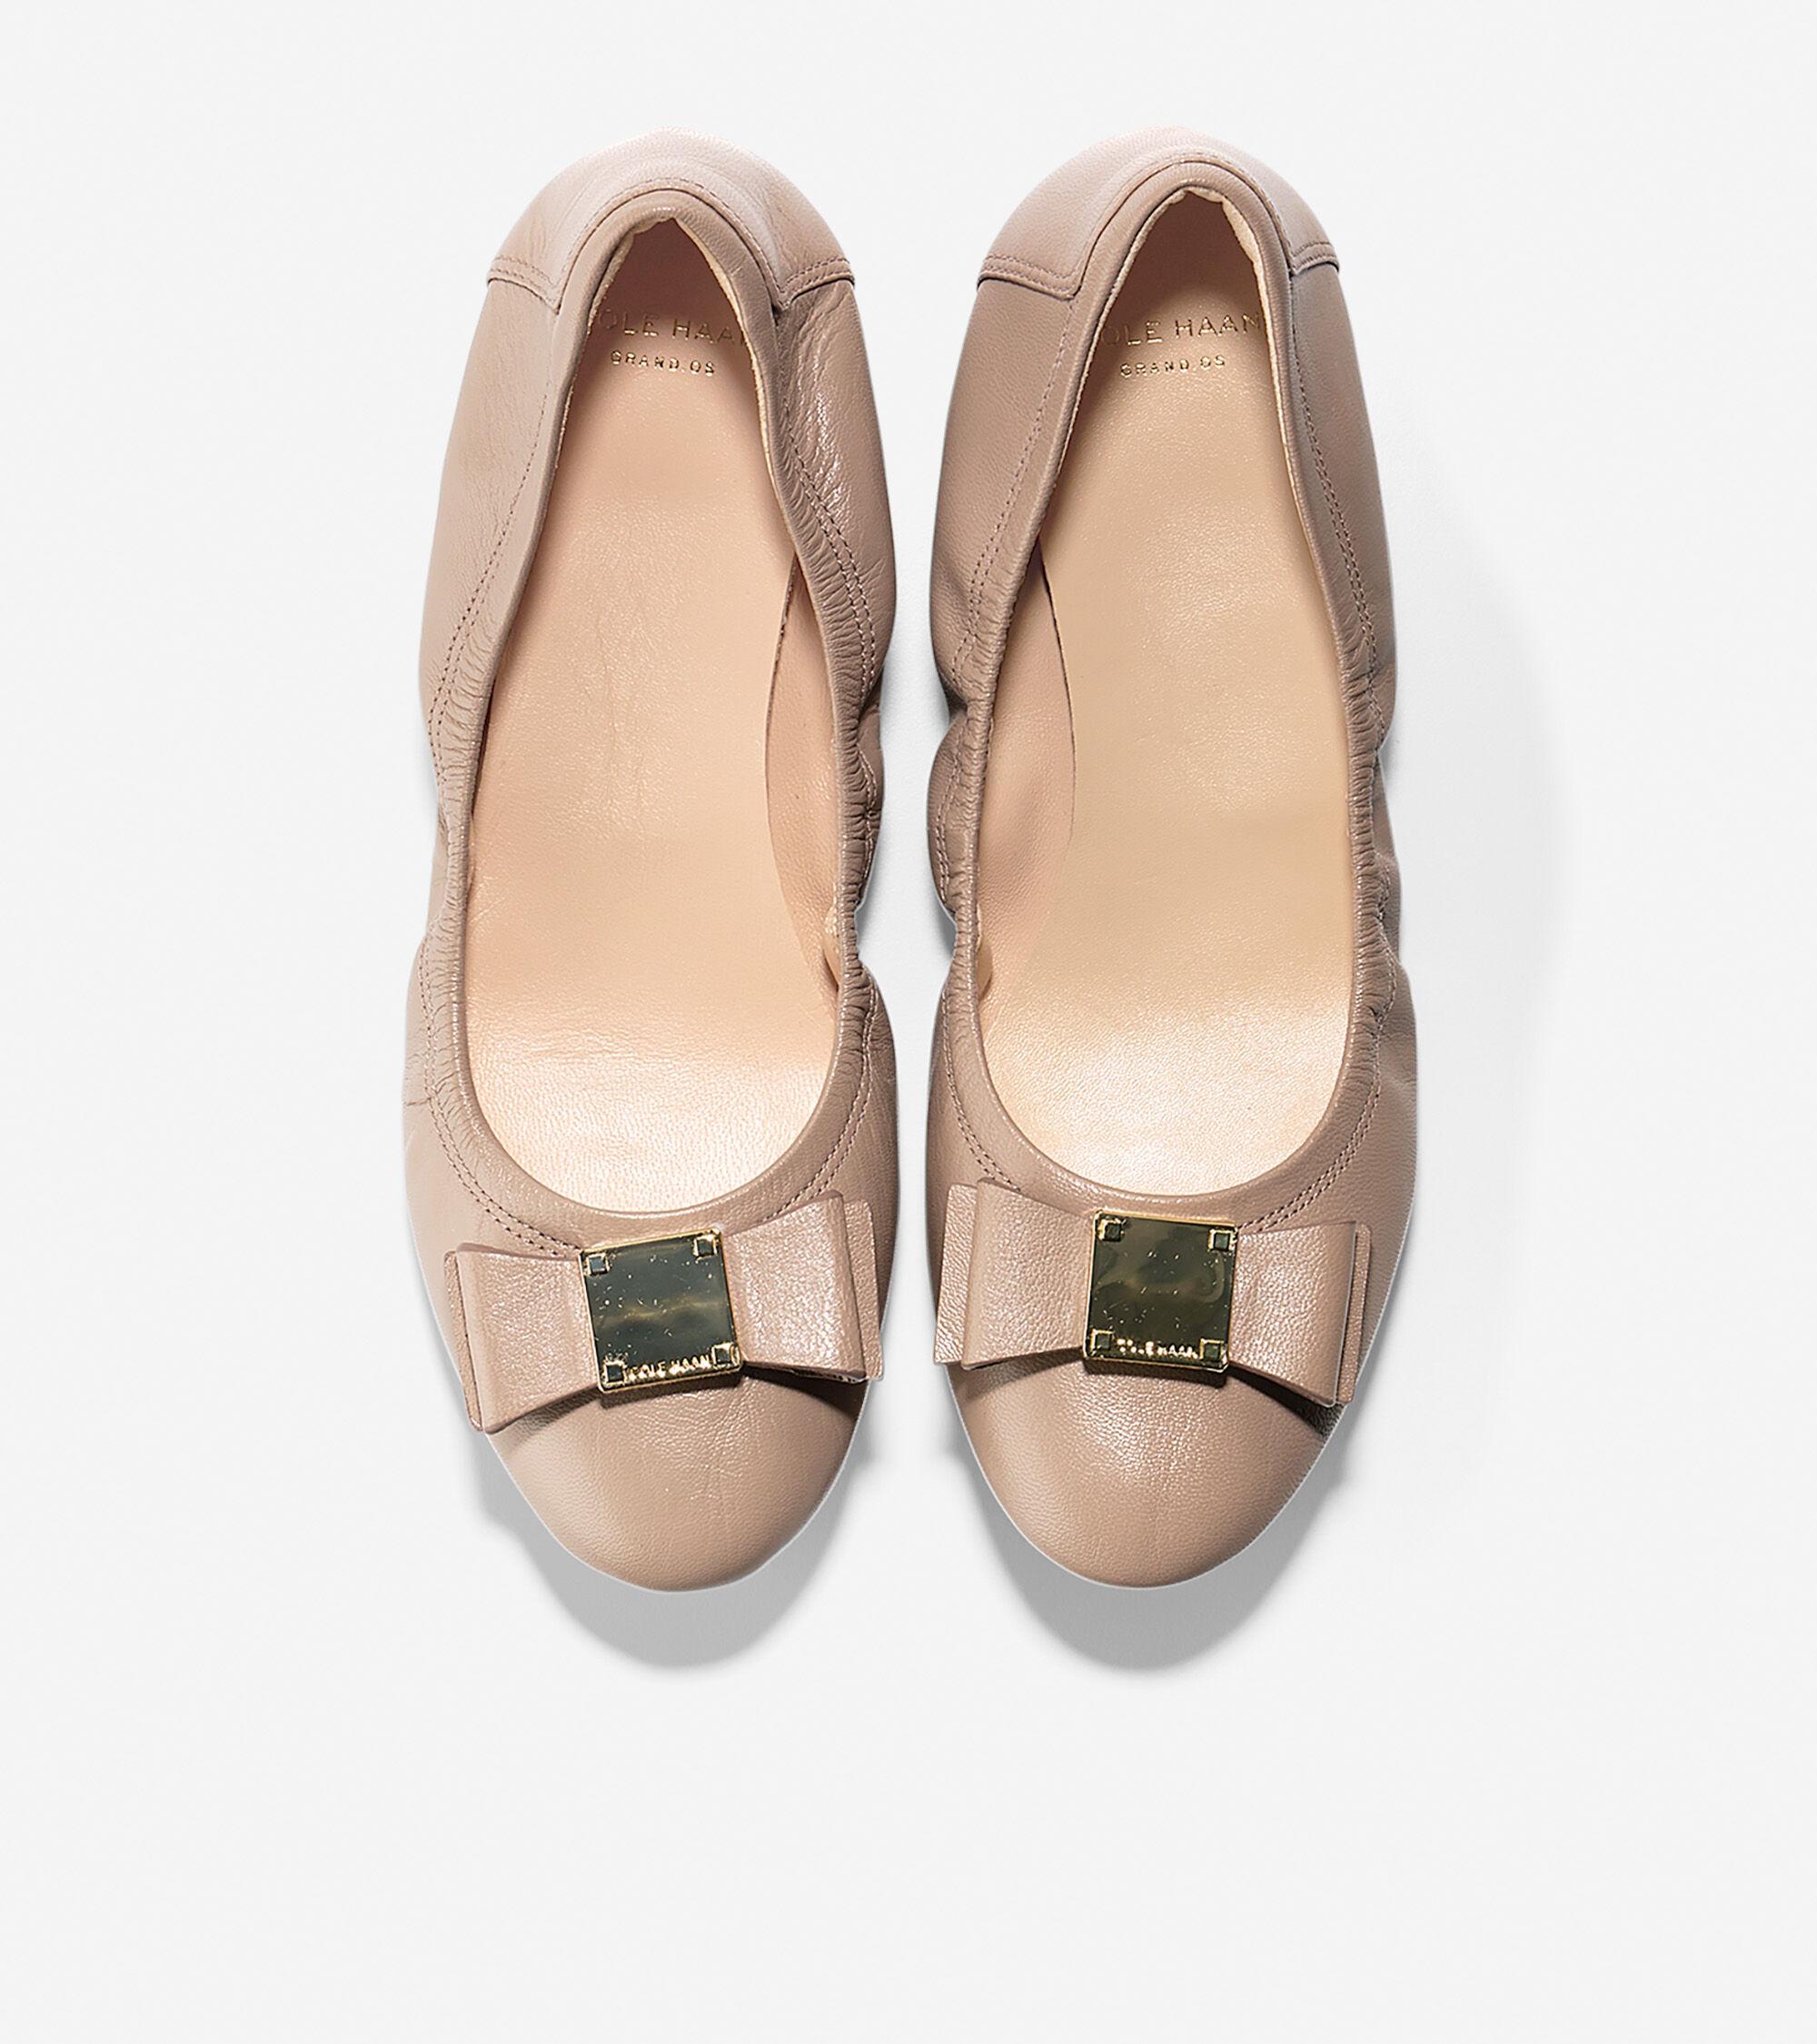 03c069a7edca Women s Tali Bow Ballet Flats in Maple Sugar